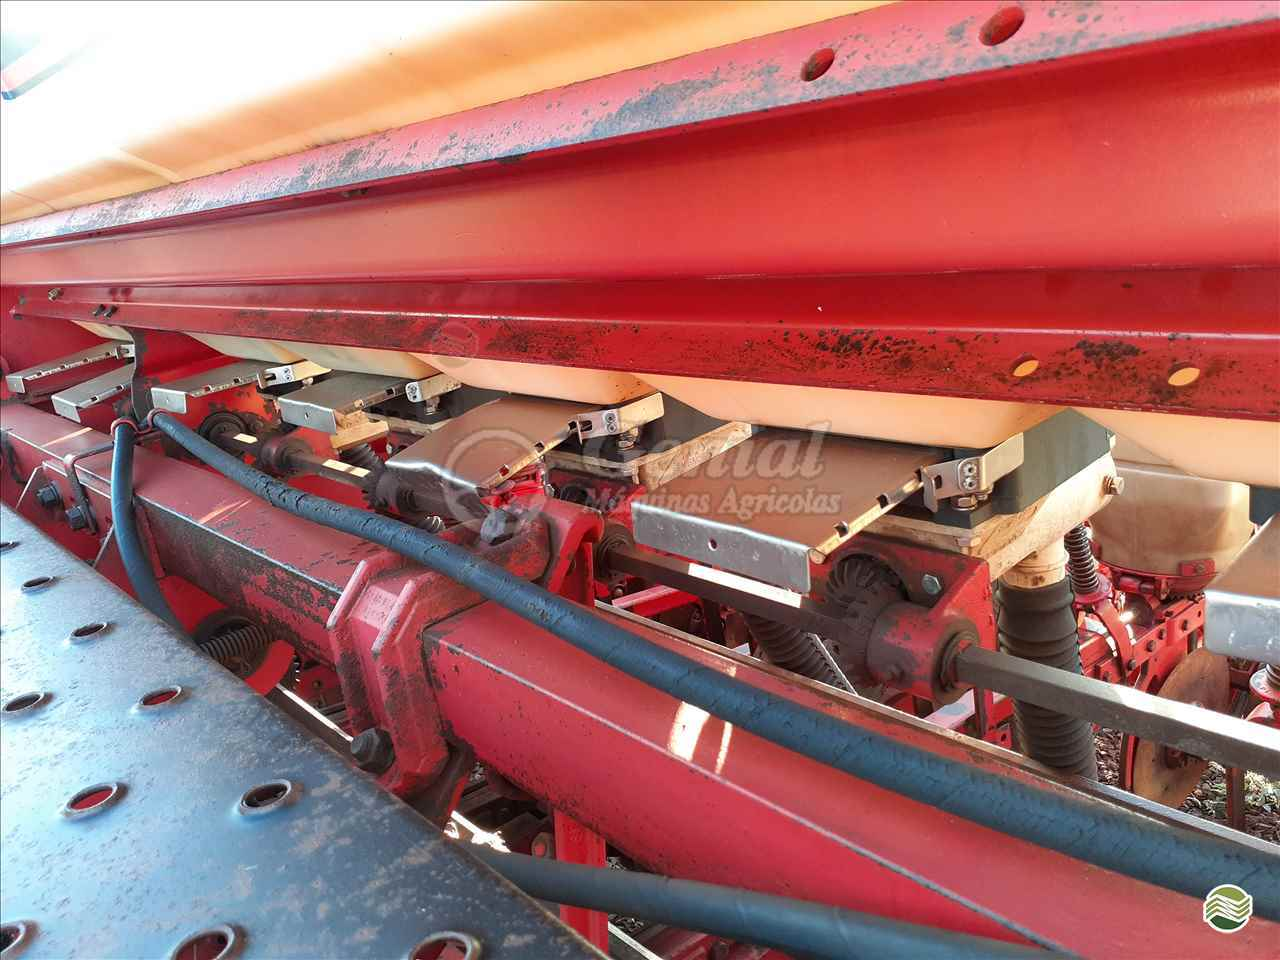 SEMEATO SEMEATO PS 11  2008/2008 Genial Máquinas